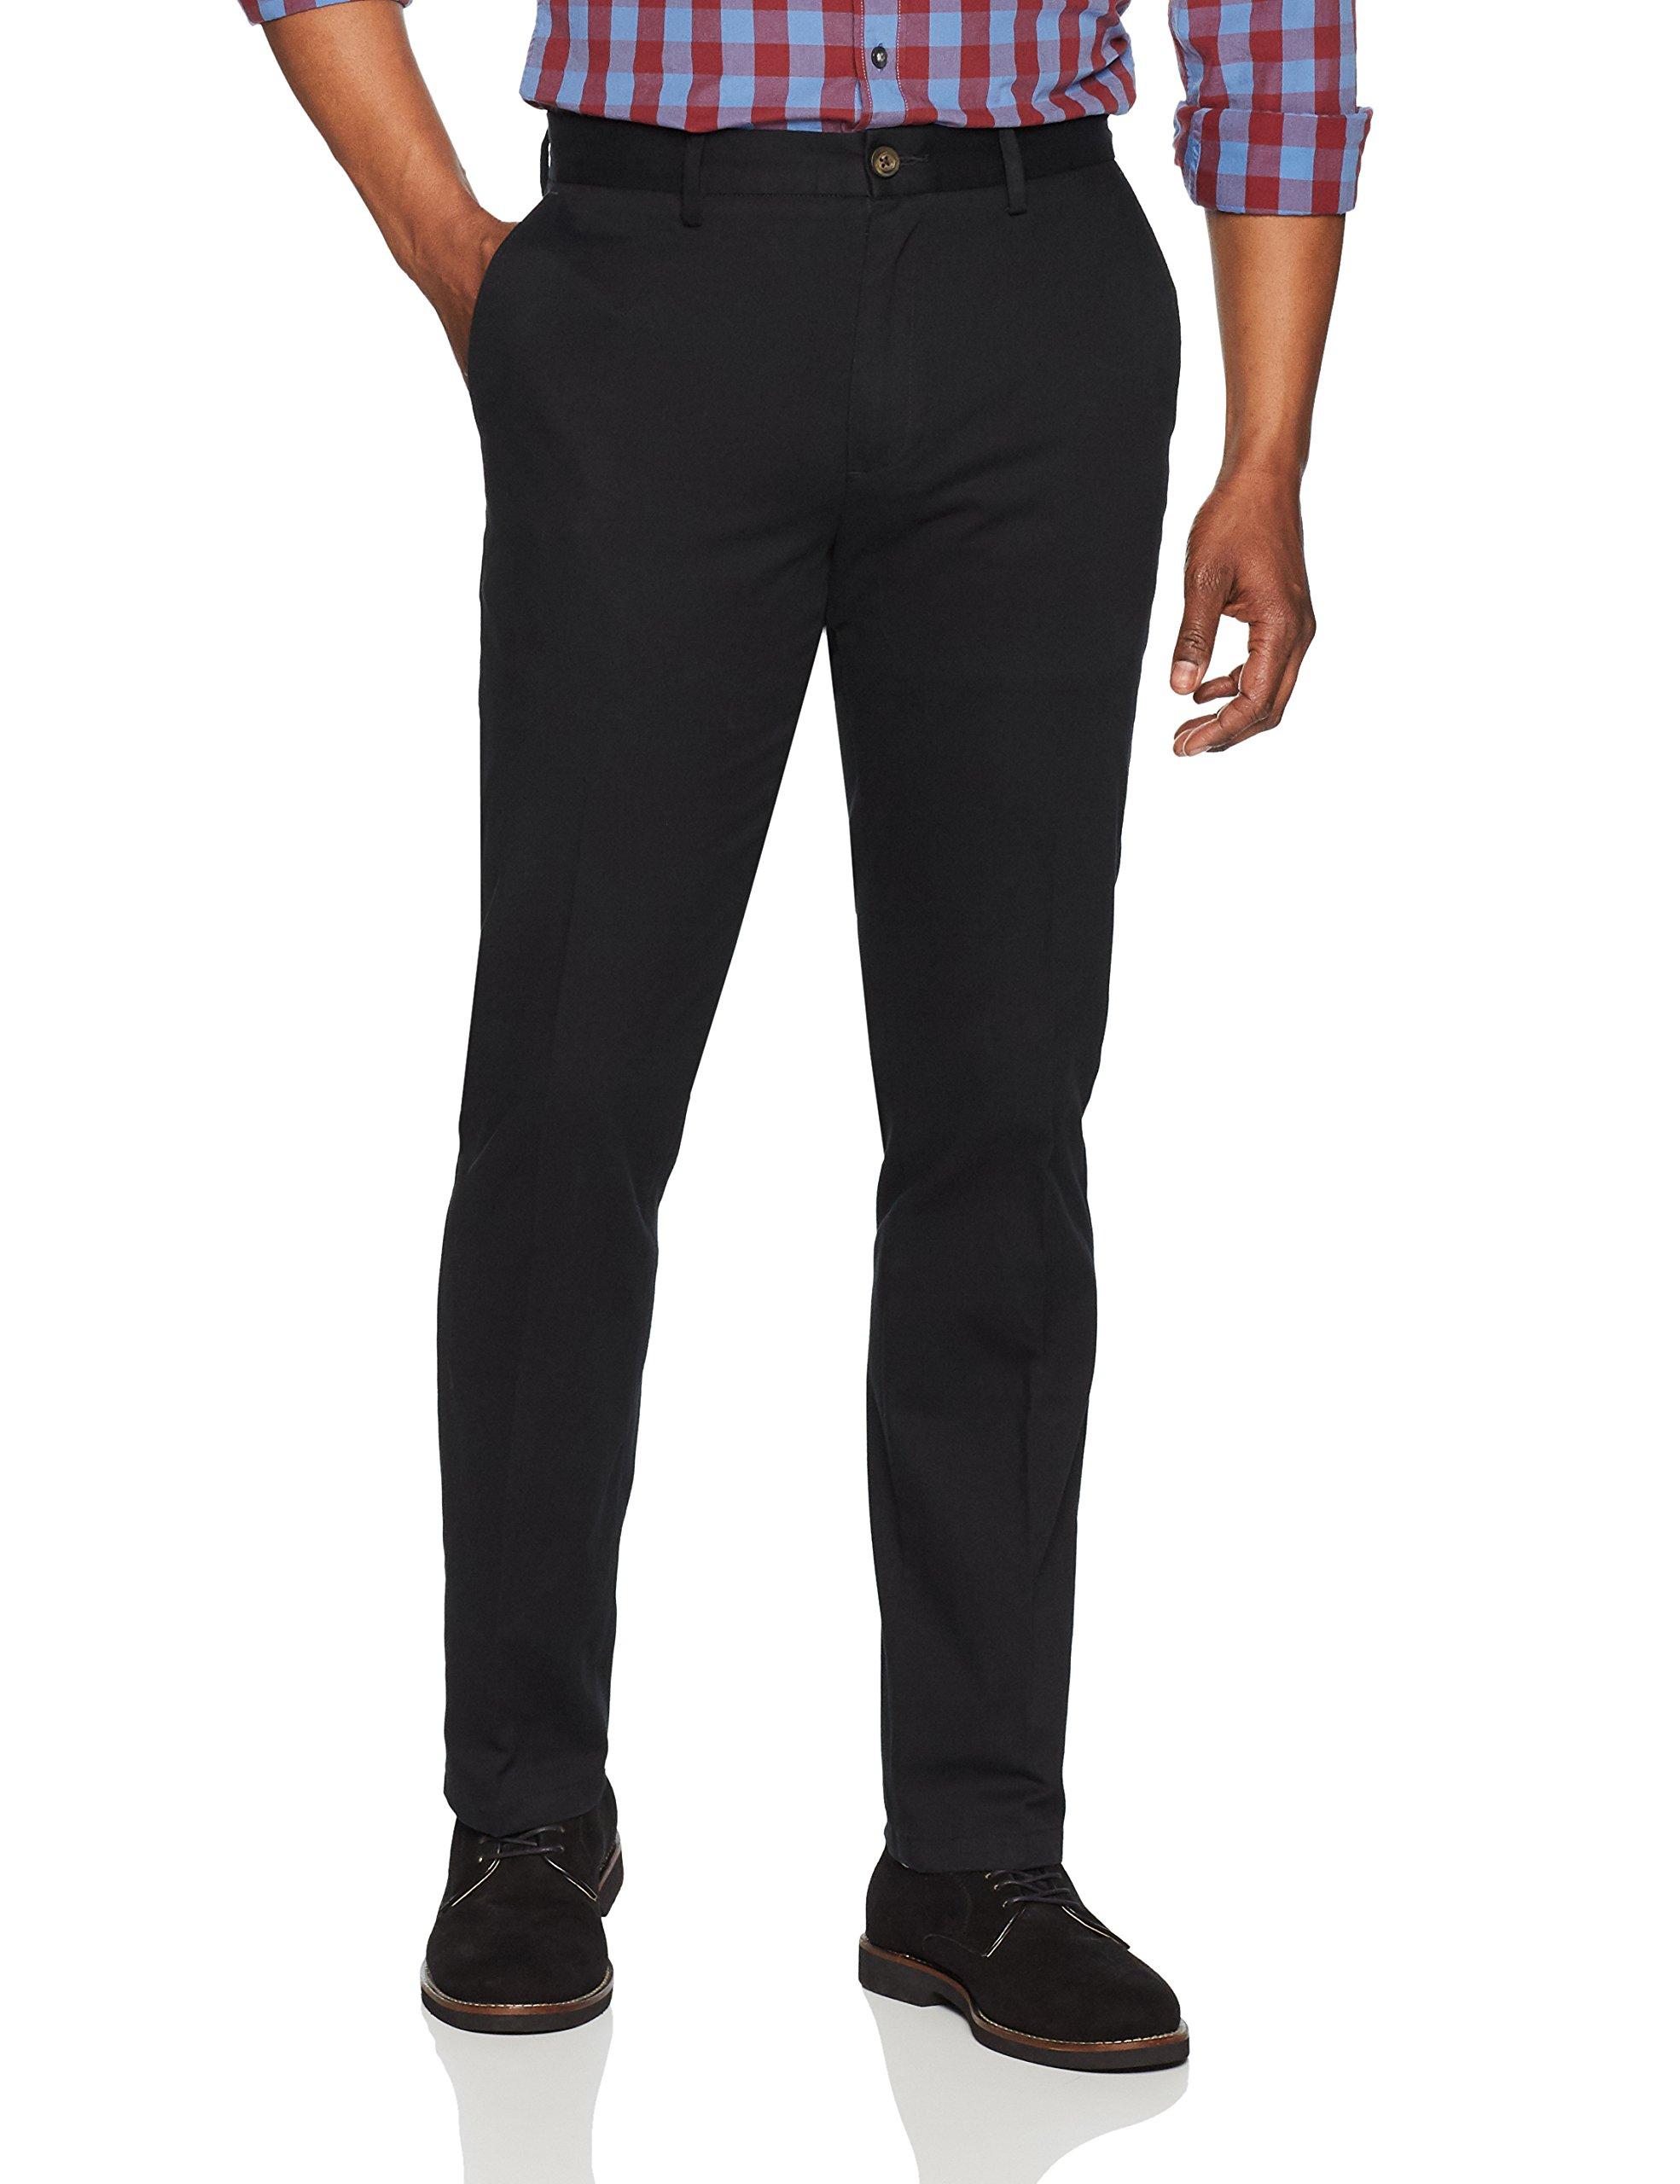 Amazon Essentials Men's Slim-Fit Wrinkle-Resistant Flat-Front Chino Pant, Black, 34W x 32L by Amazon Essentials